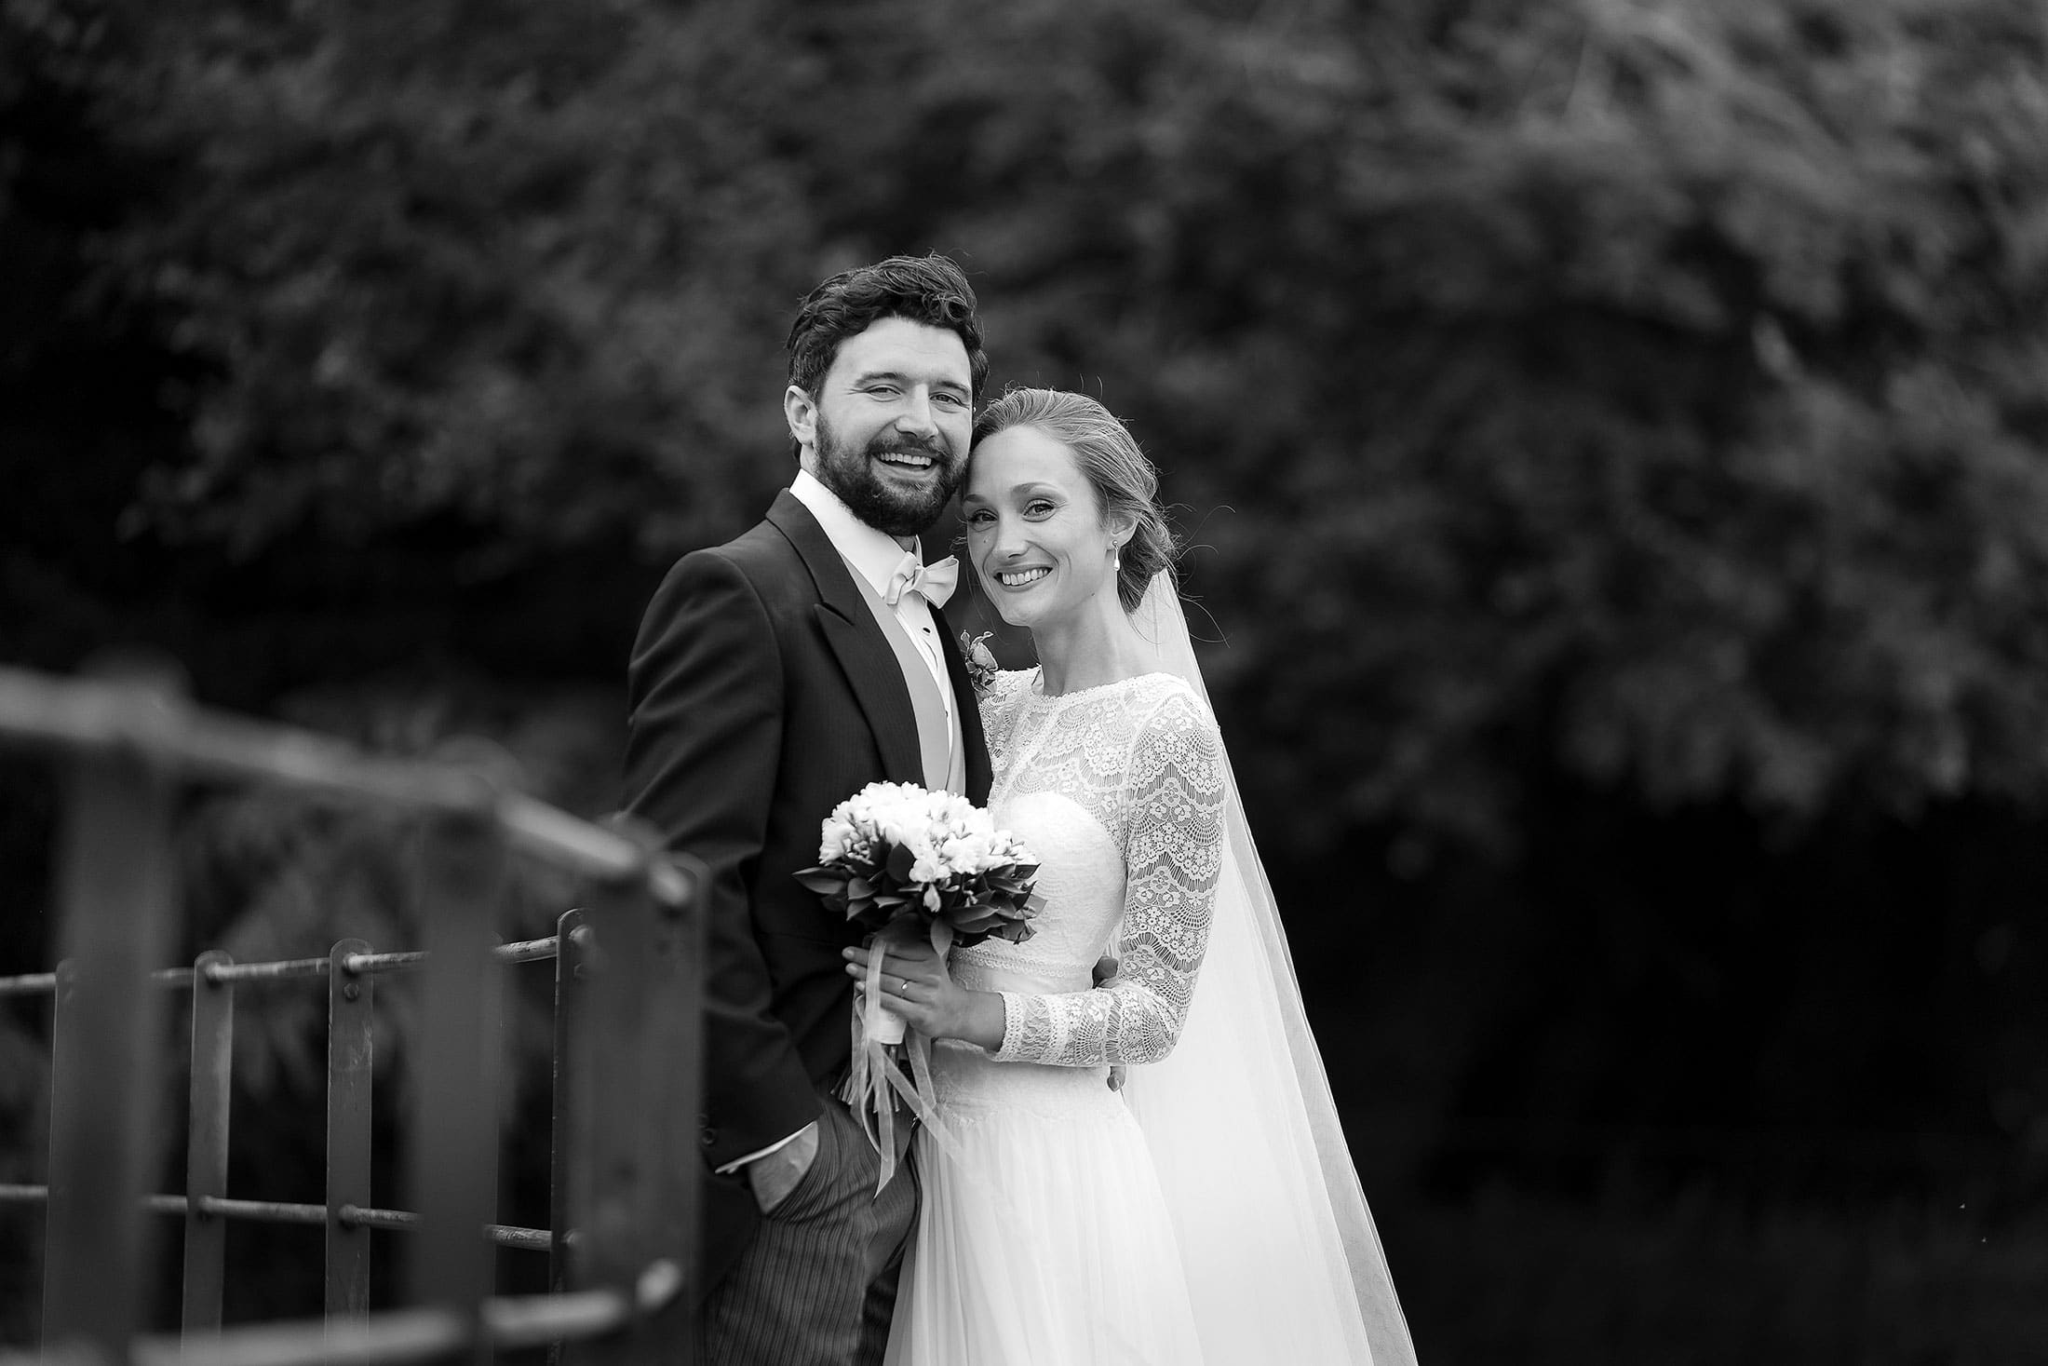 Suffolk Barn wedding photographer of Lucy & Max